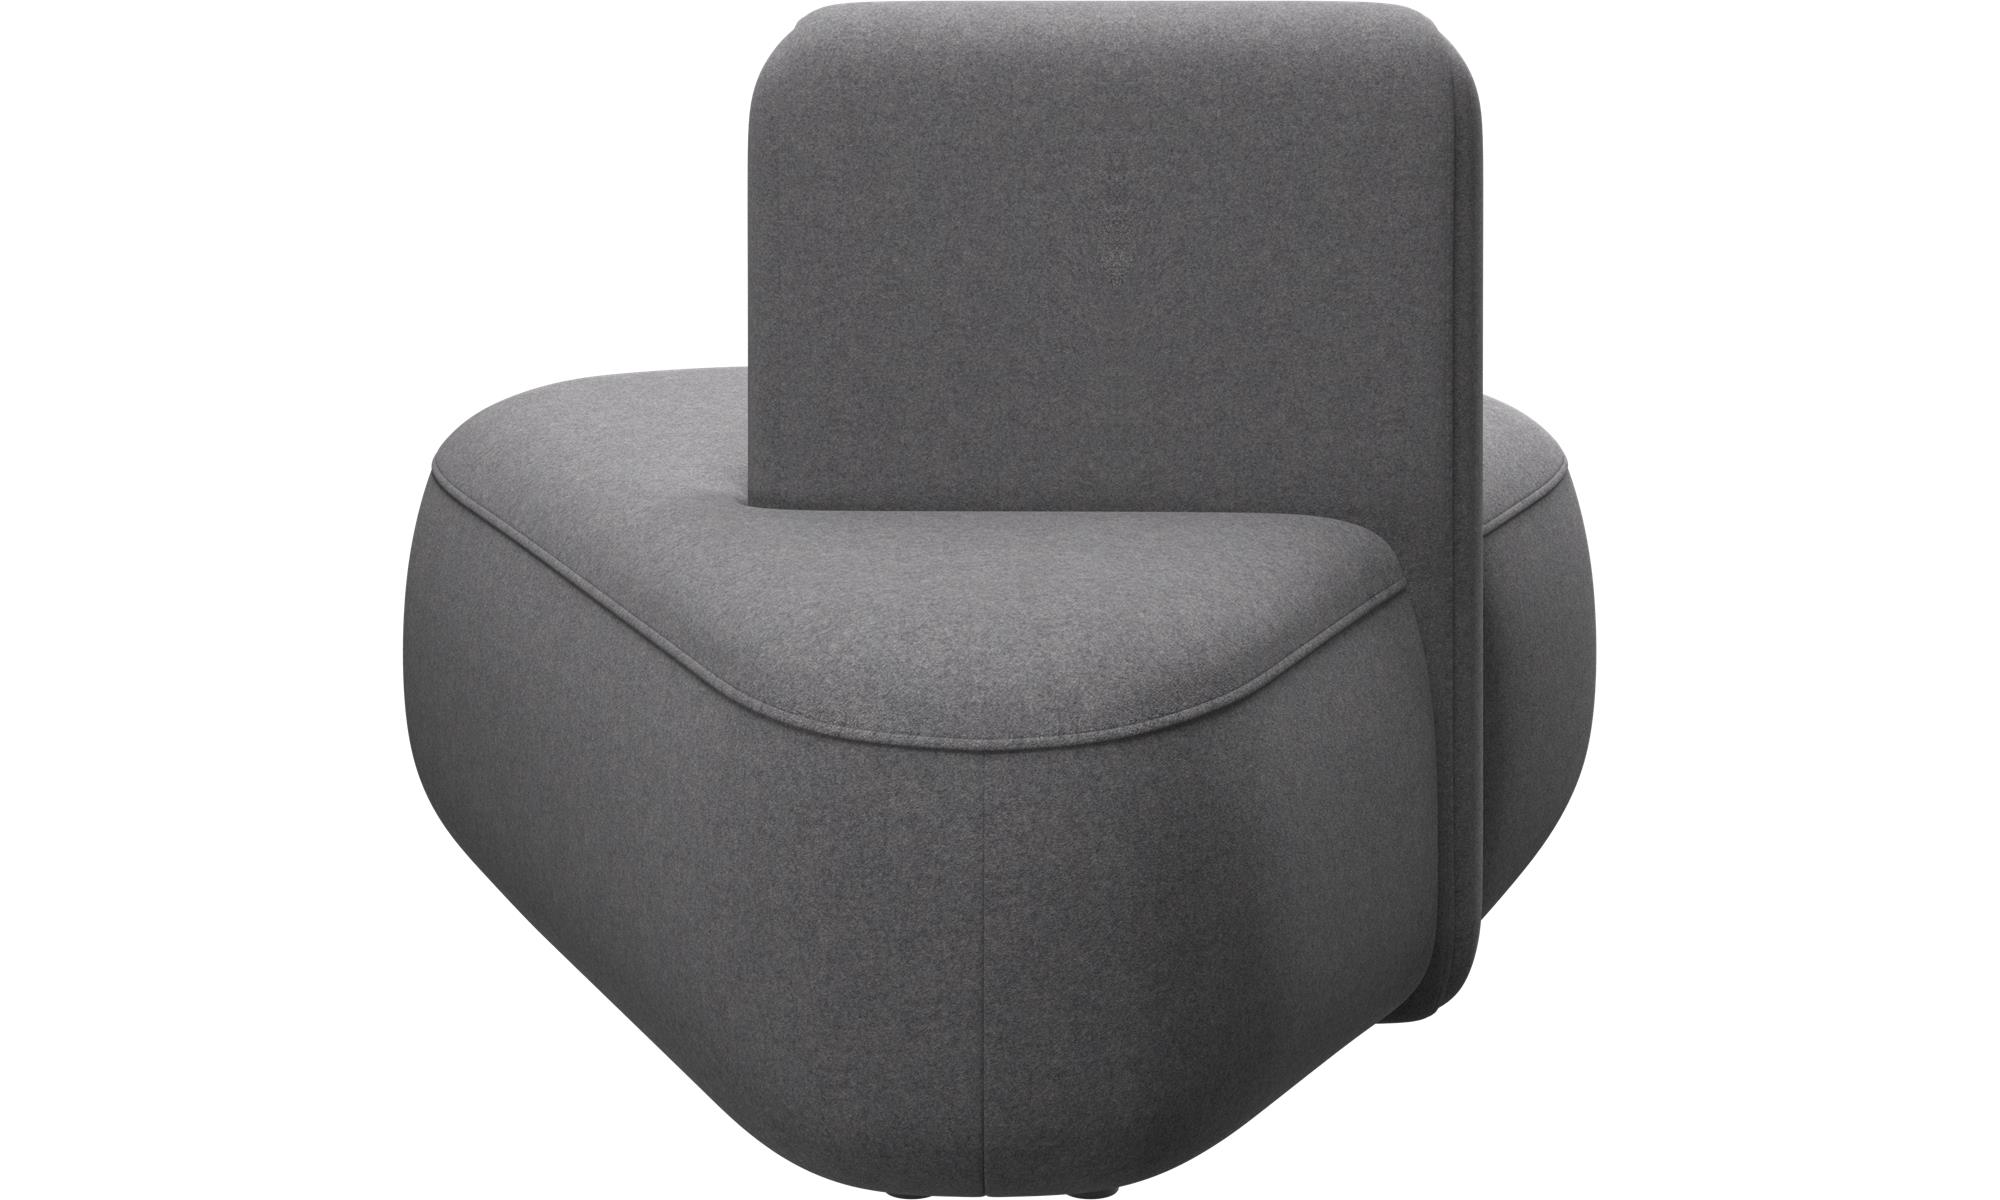 modular sofas ottawa triangular pouf low back boconcept. Black Bedroom Furniture Sets. Home Design Ideas